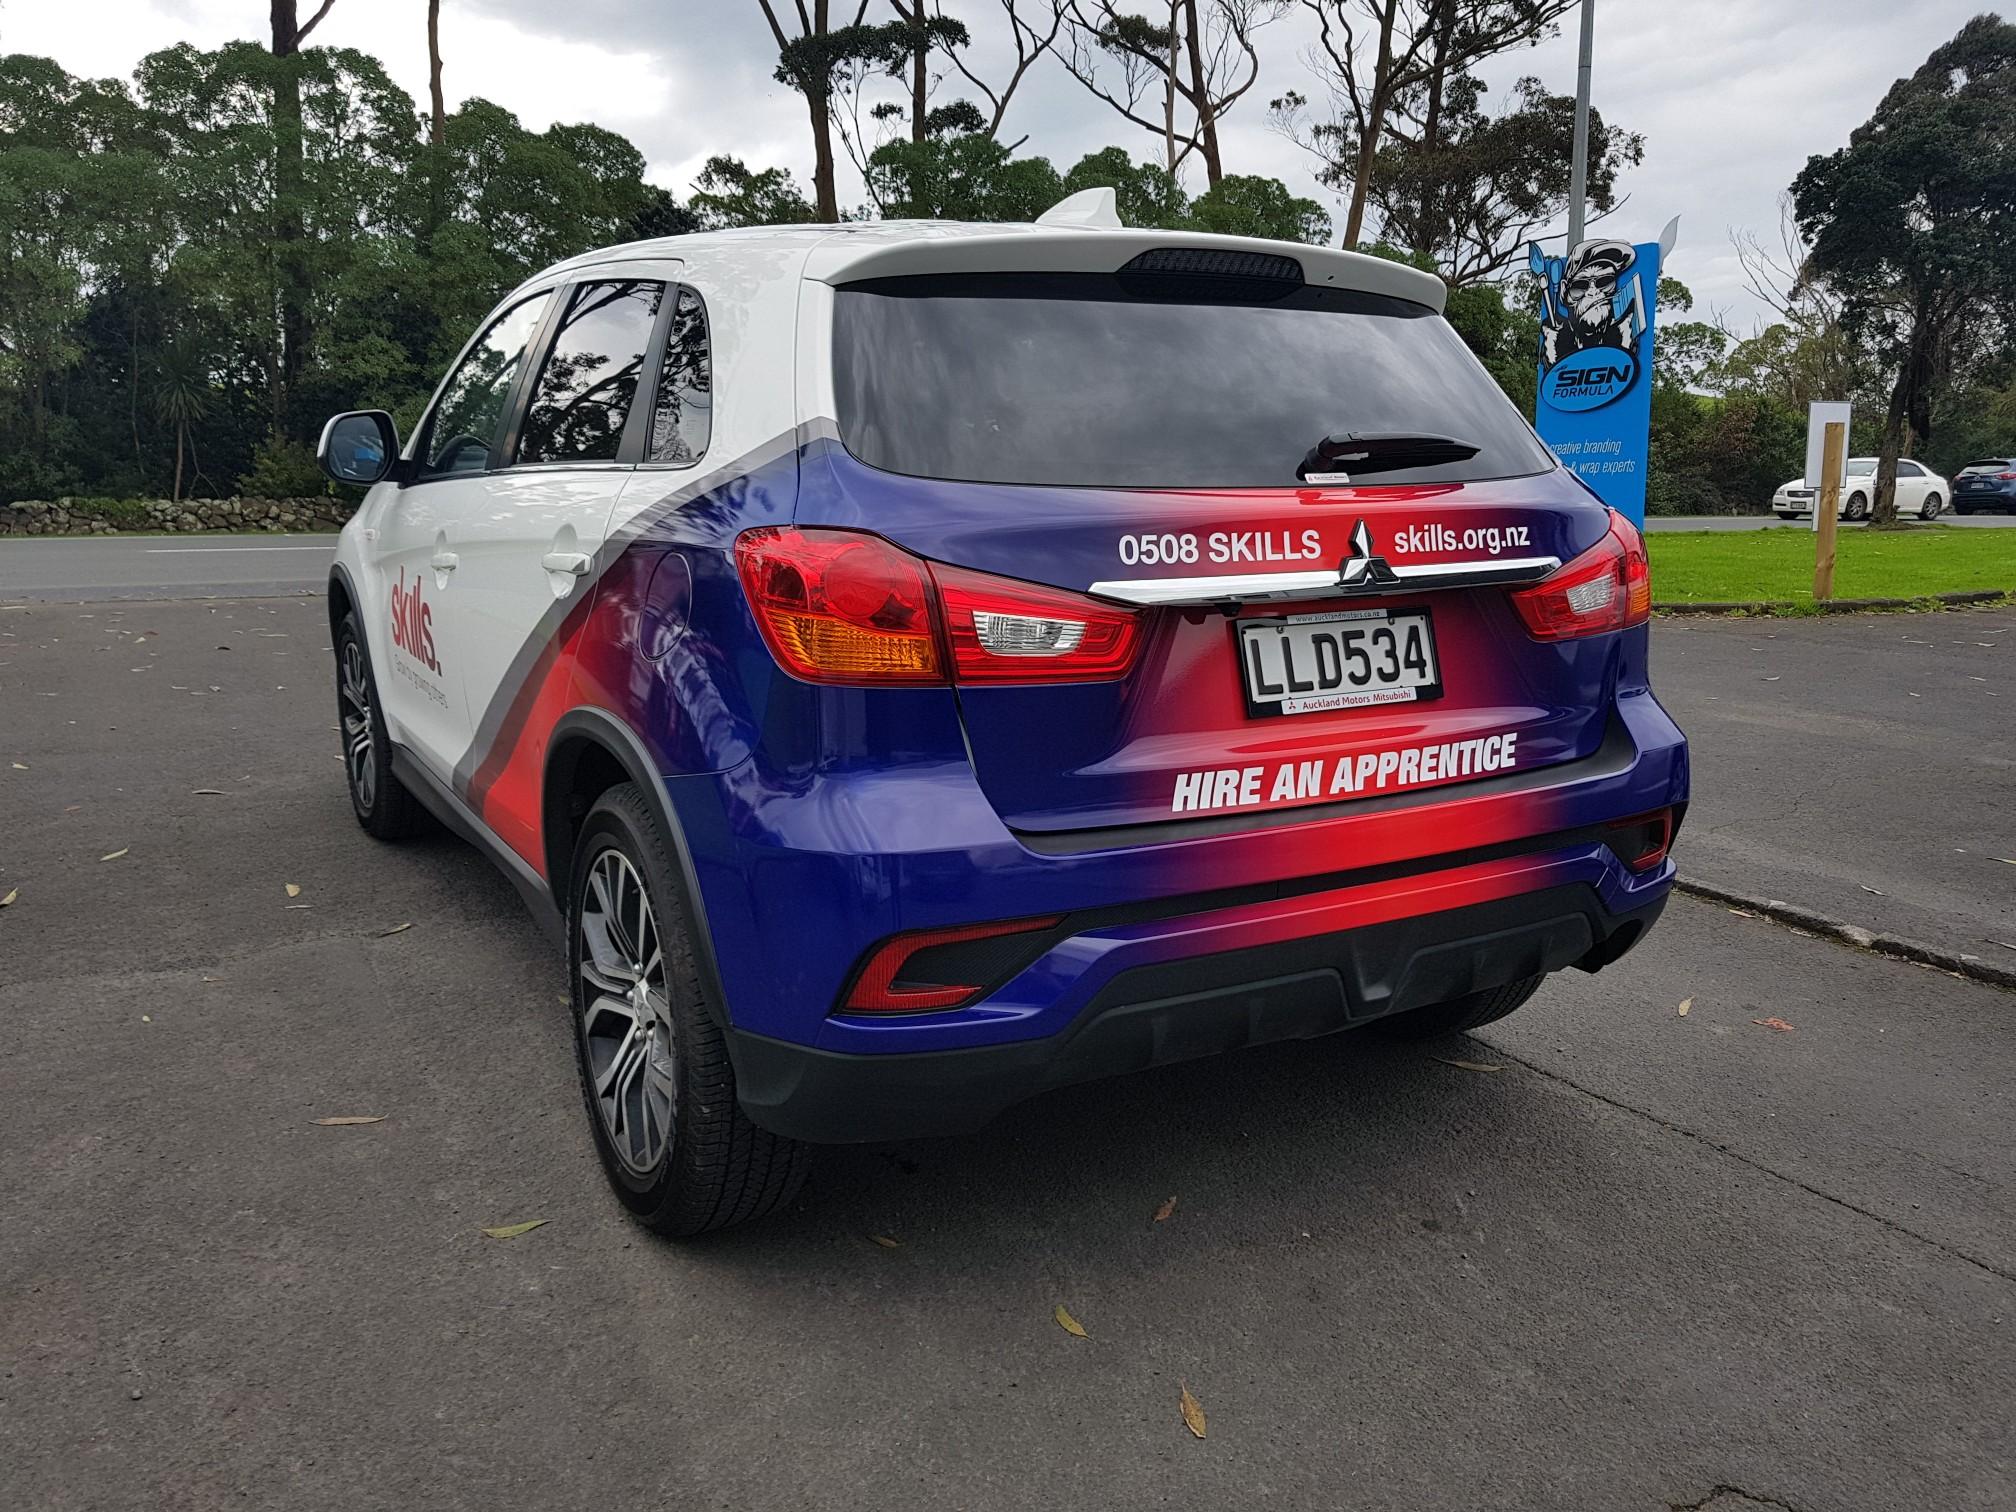 Skills car back